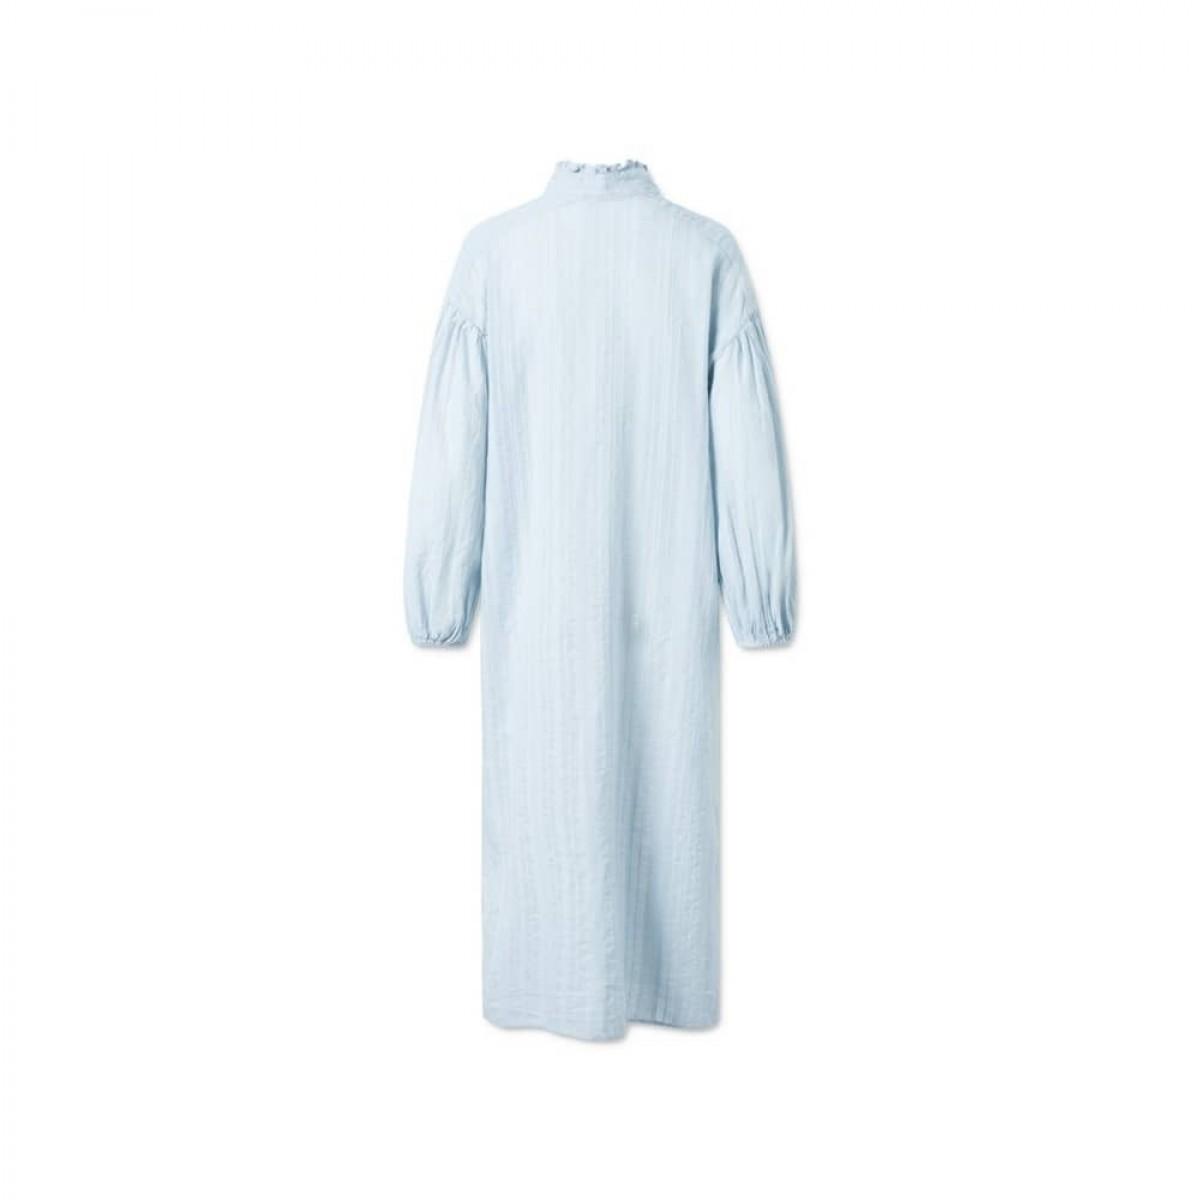 jordana dress - artic ice - ryggen